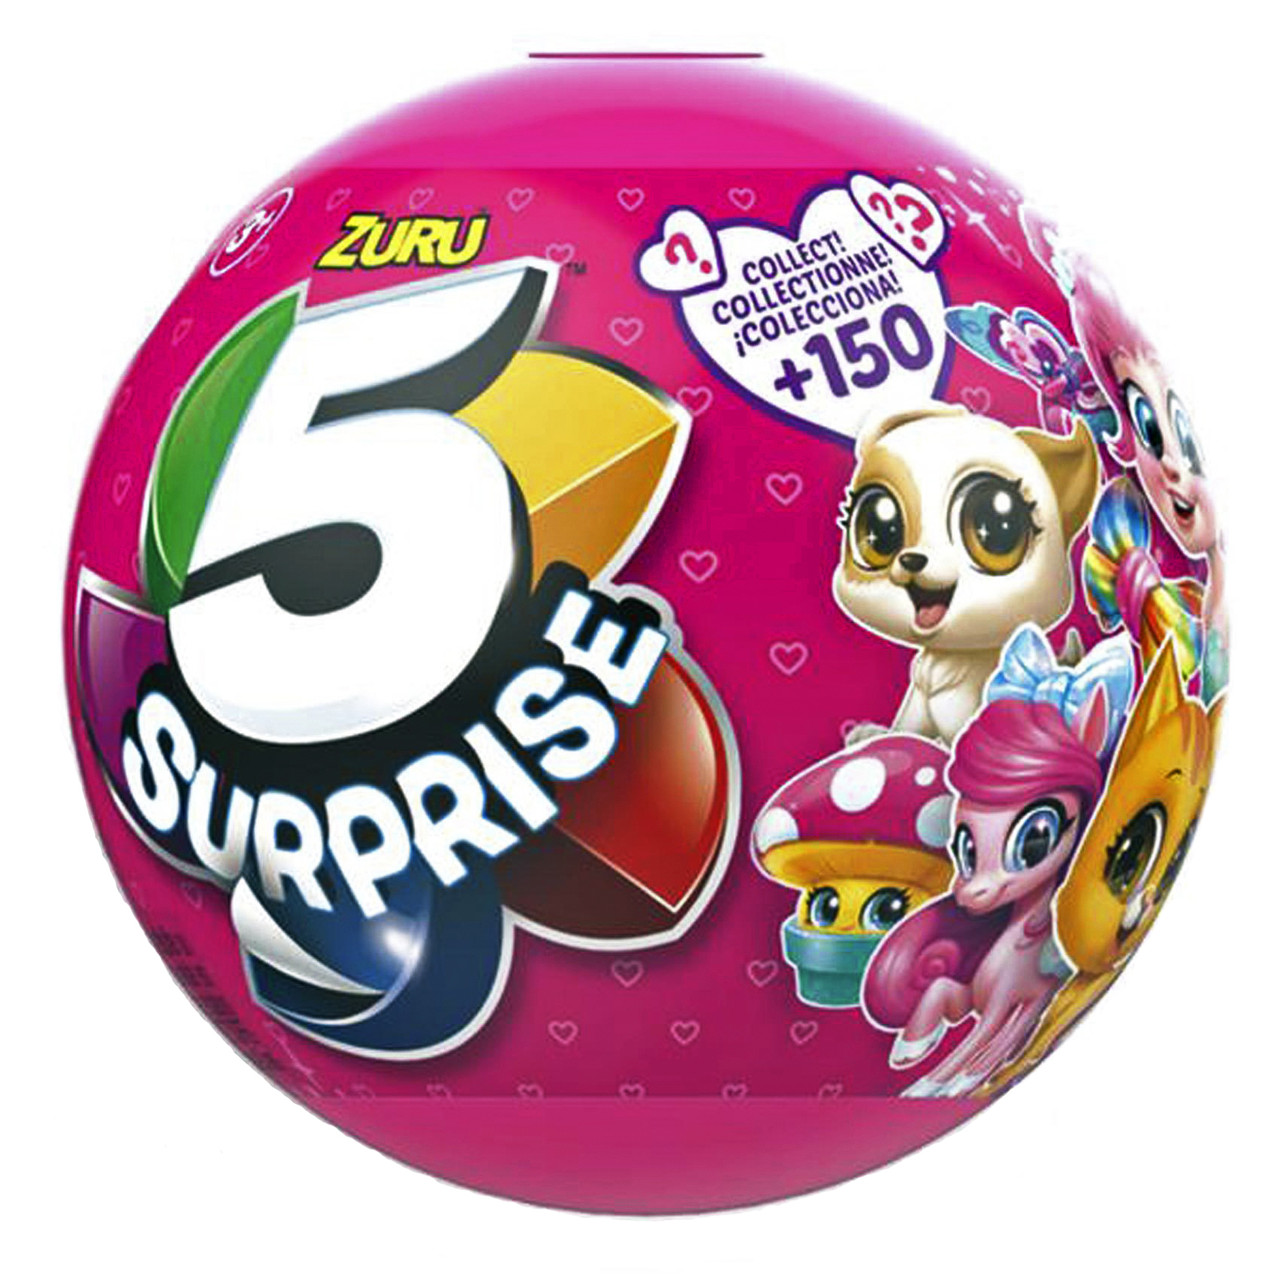 Шар сюрприз для девочек 5 Surprise Pink Mystery Capsule Collectible Toy, «Zuru» (7702)